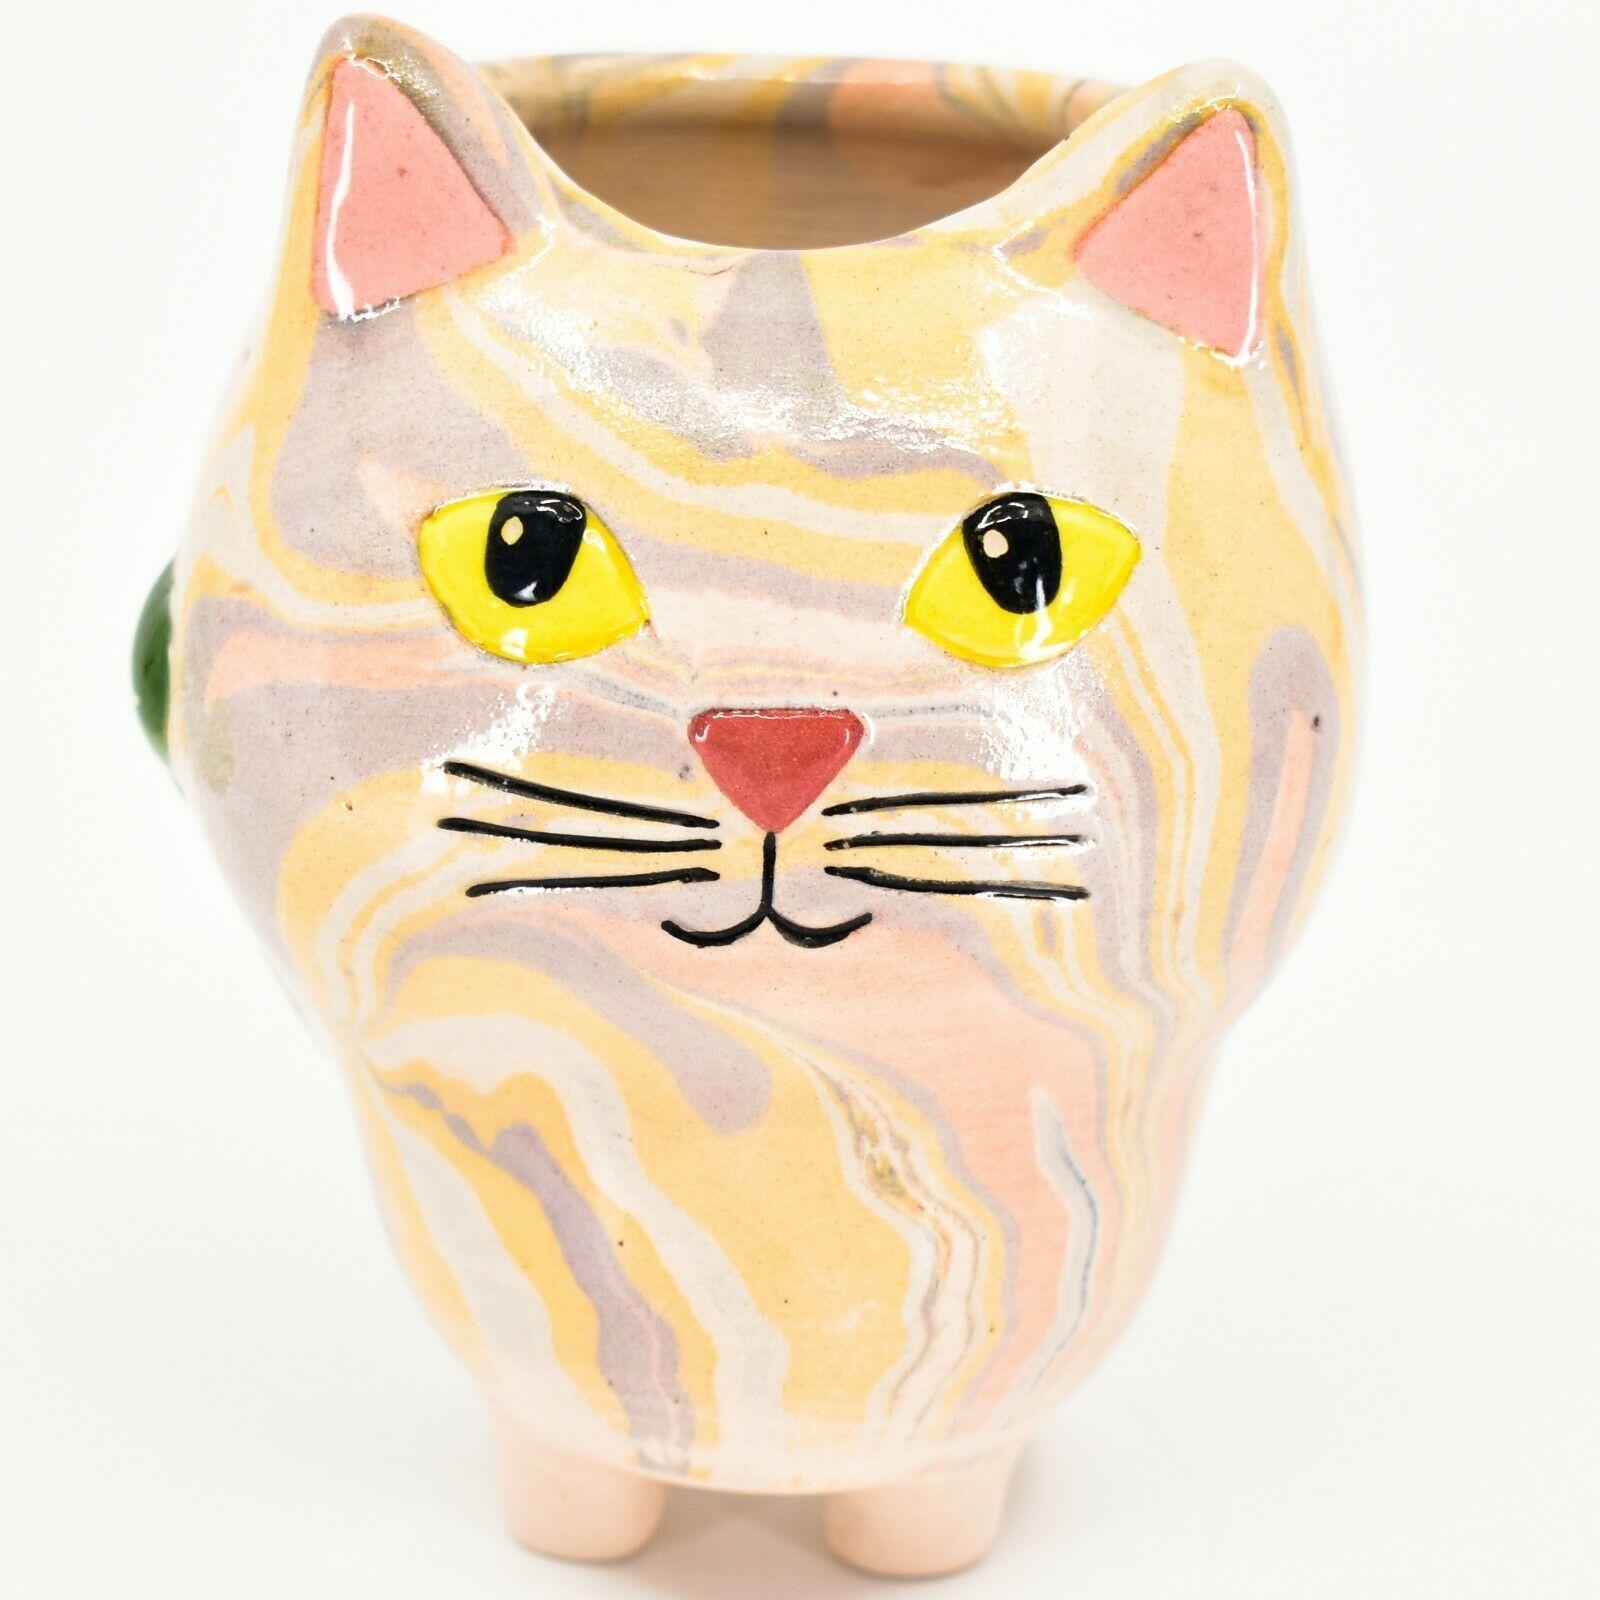 Handmade Ceramic Swirl Small Cactus Succulent Mini Plant Cat Shaped Planter Pot